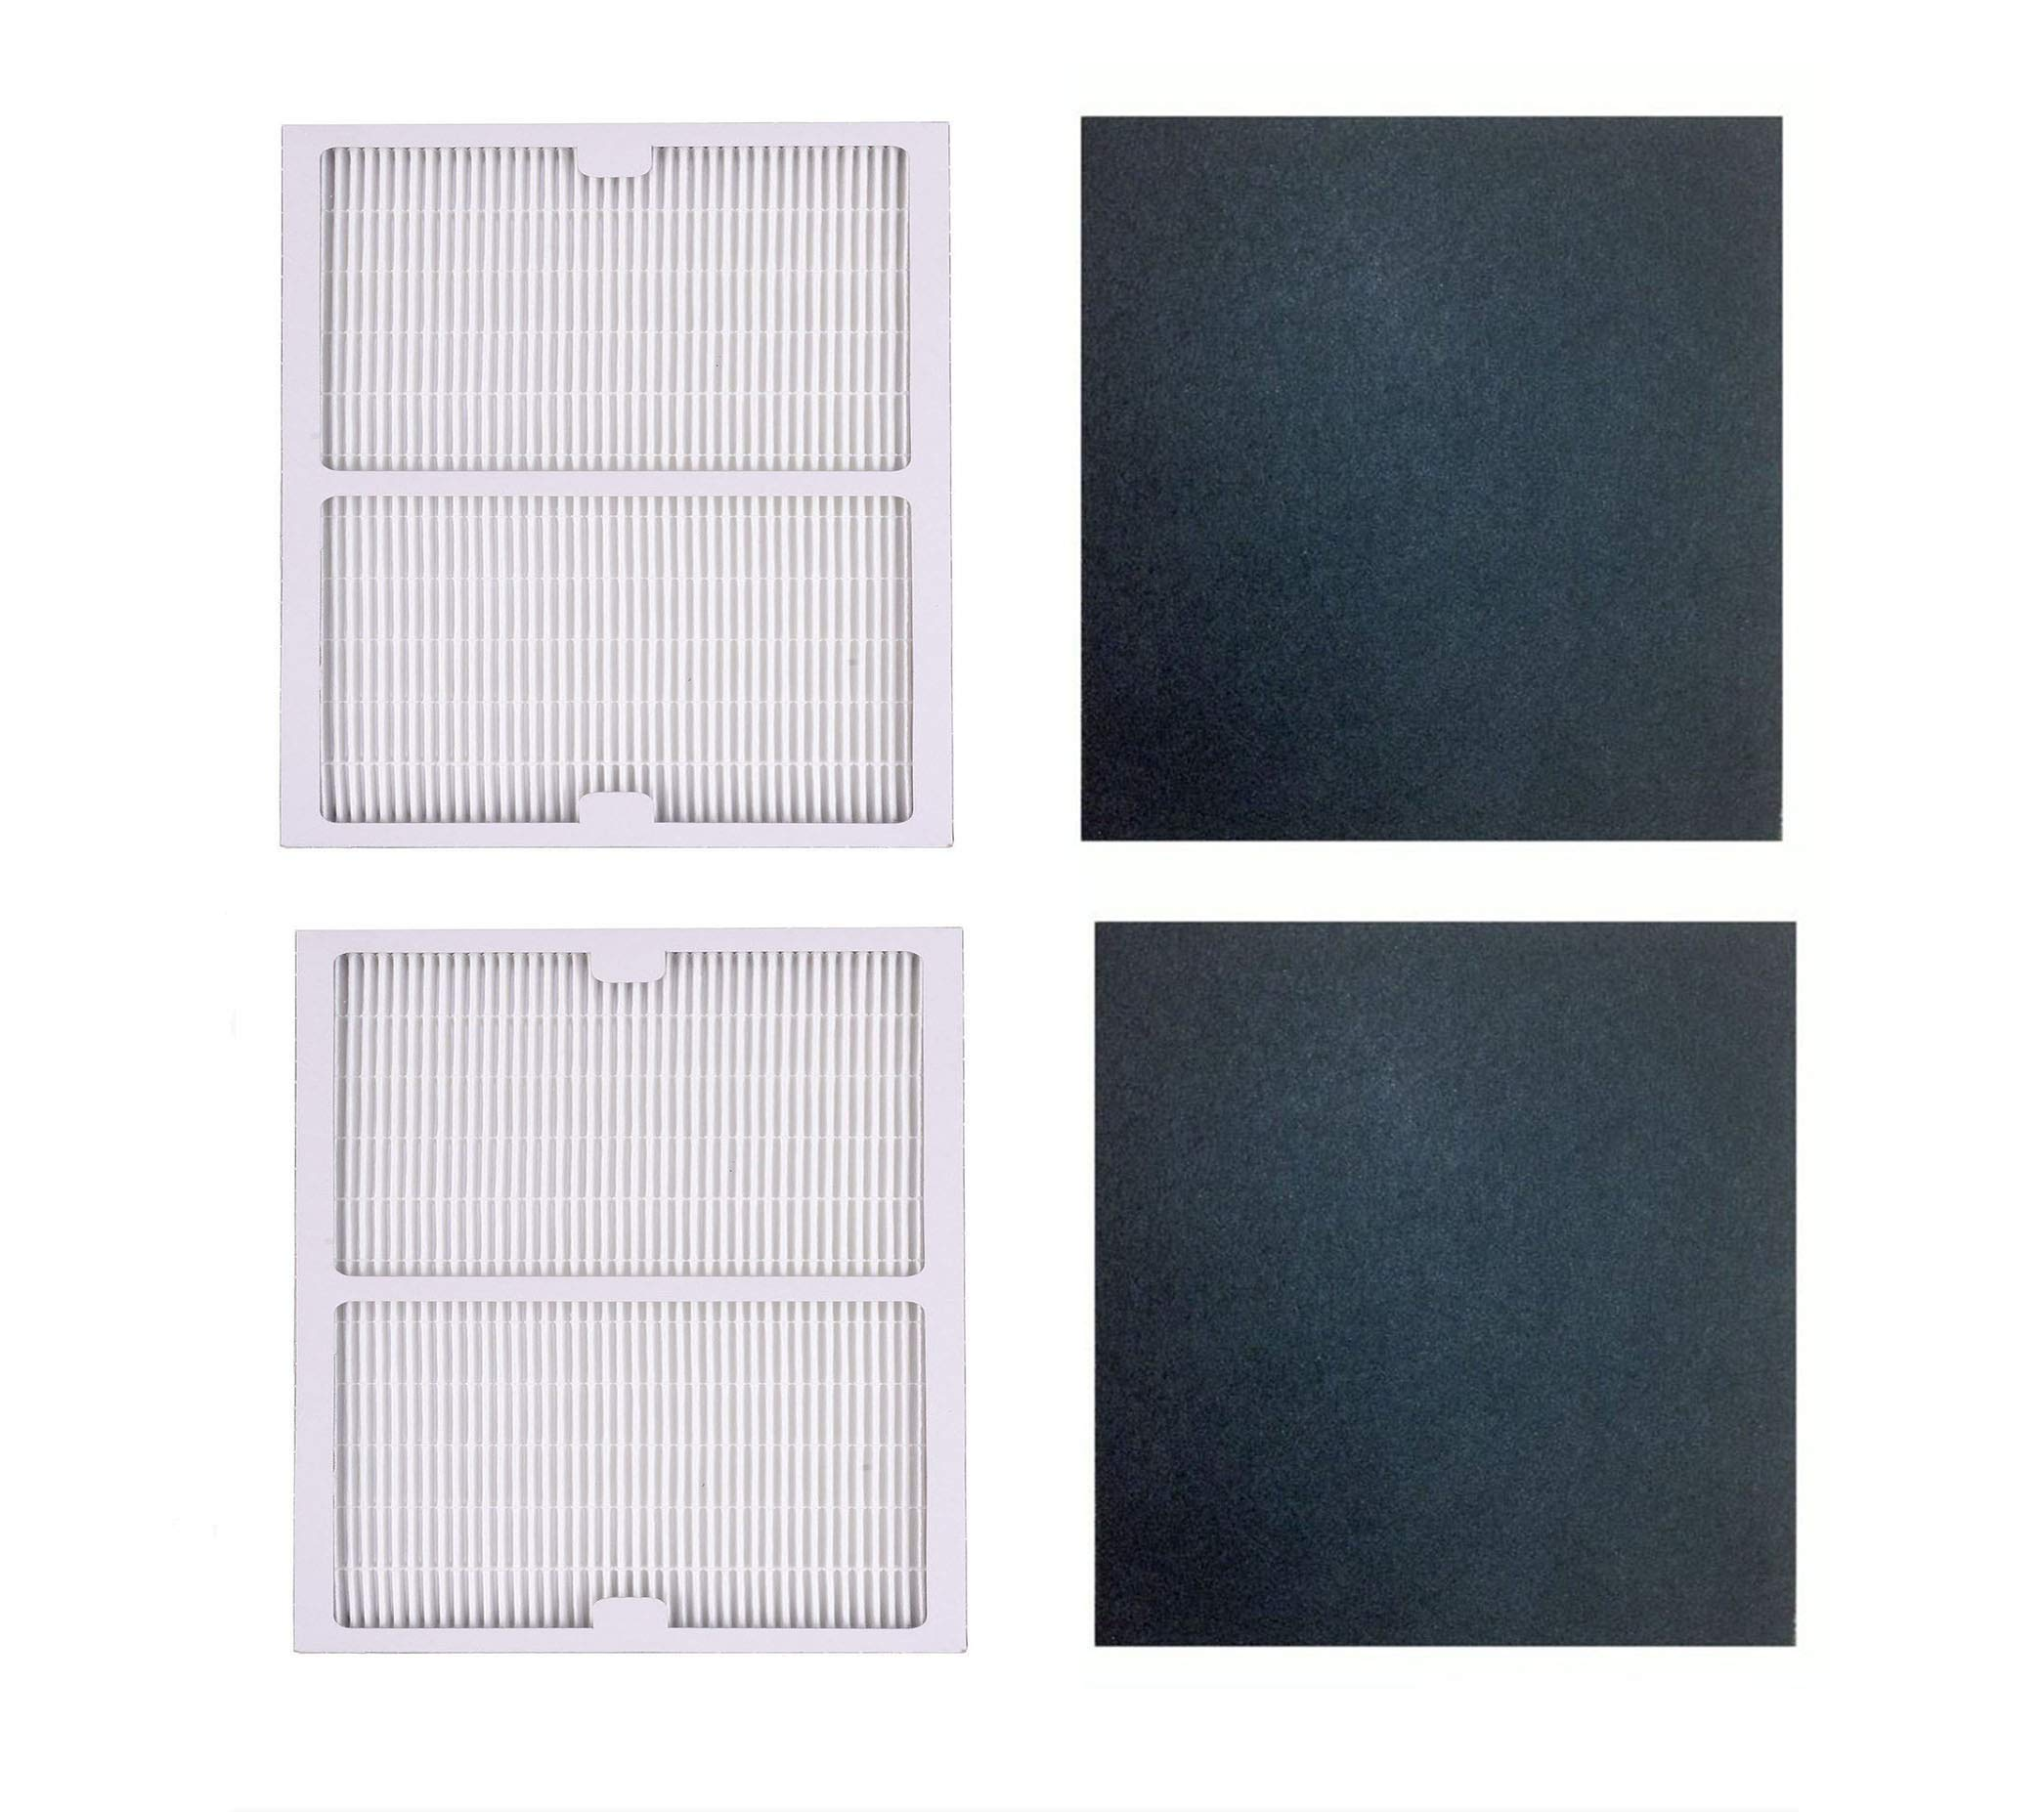 Ximoon 2 HEPA Filter Replacements for Idylis IAP-10-200, IAP-10-280; Model # IAF-H-100C